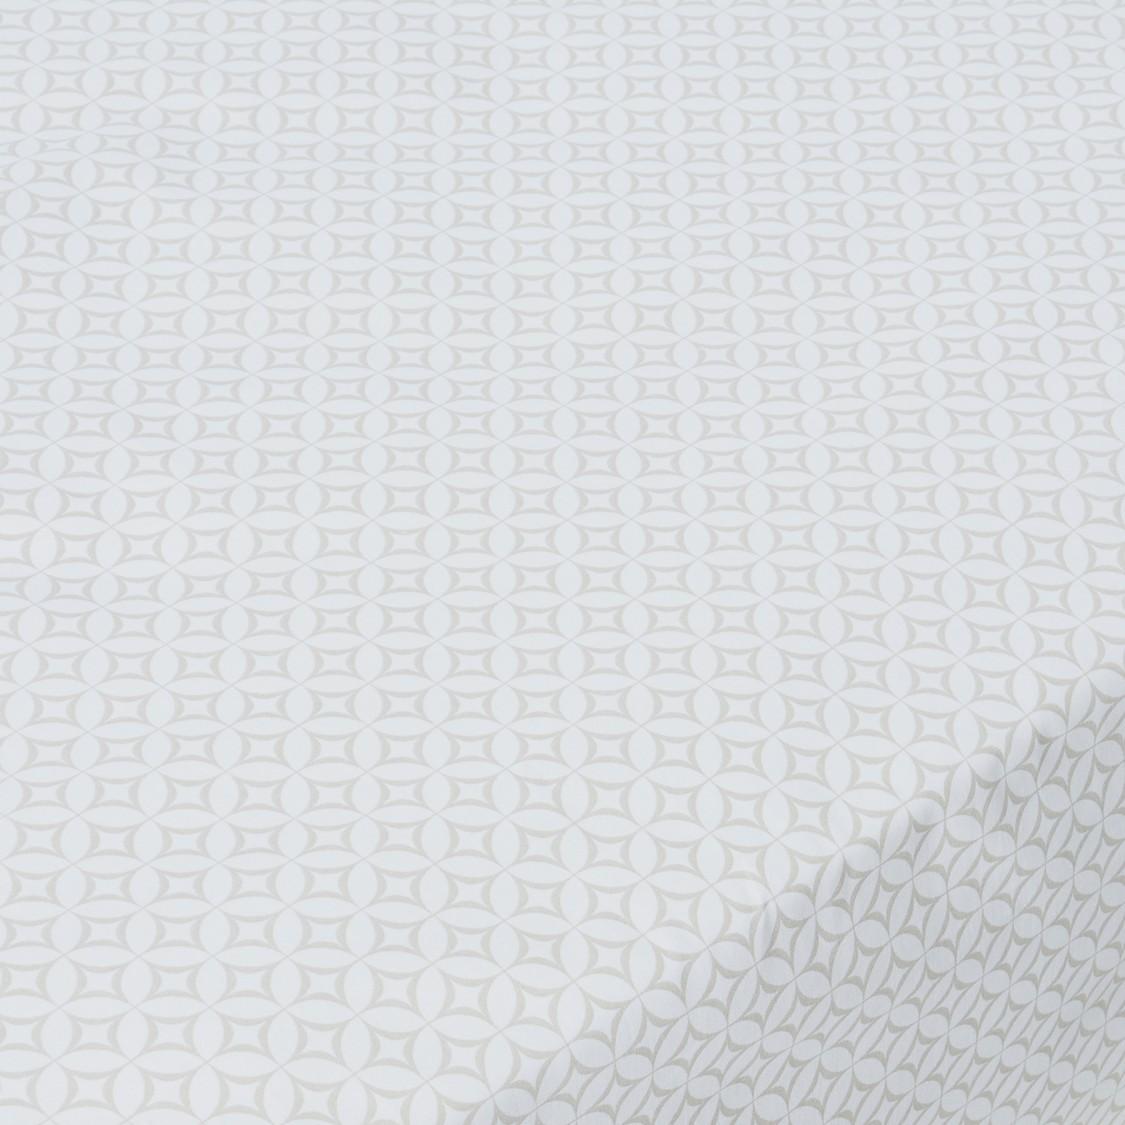 Printed 3-Piece Bedding Set - 200x90 cms